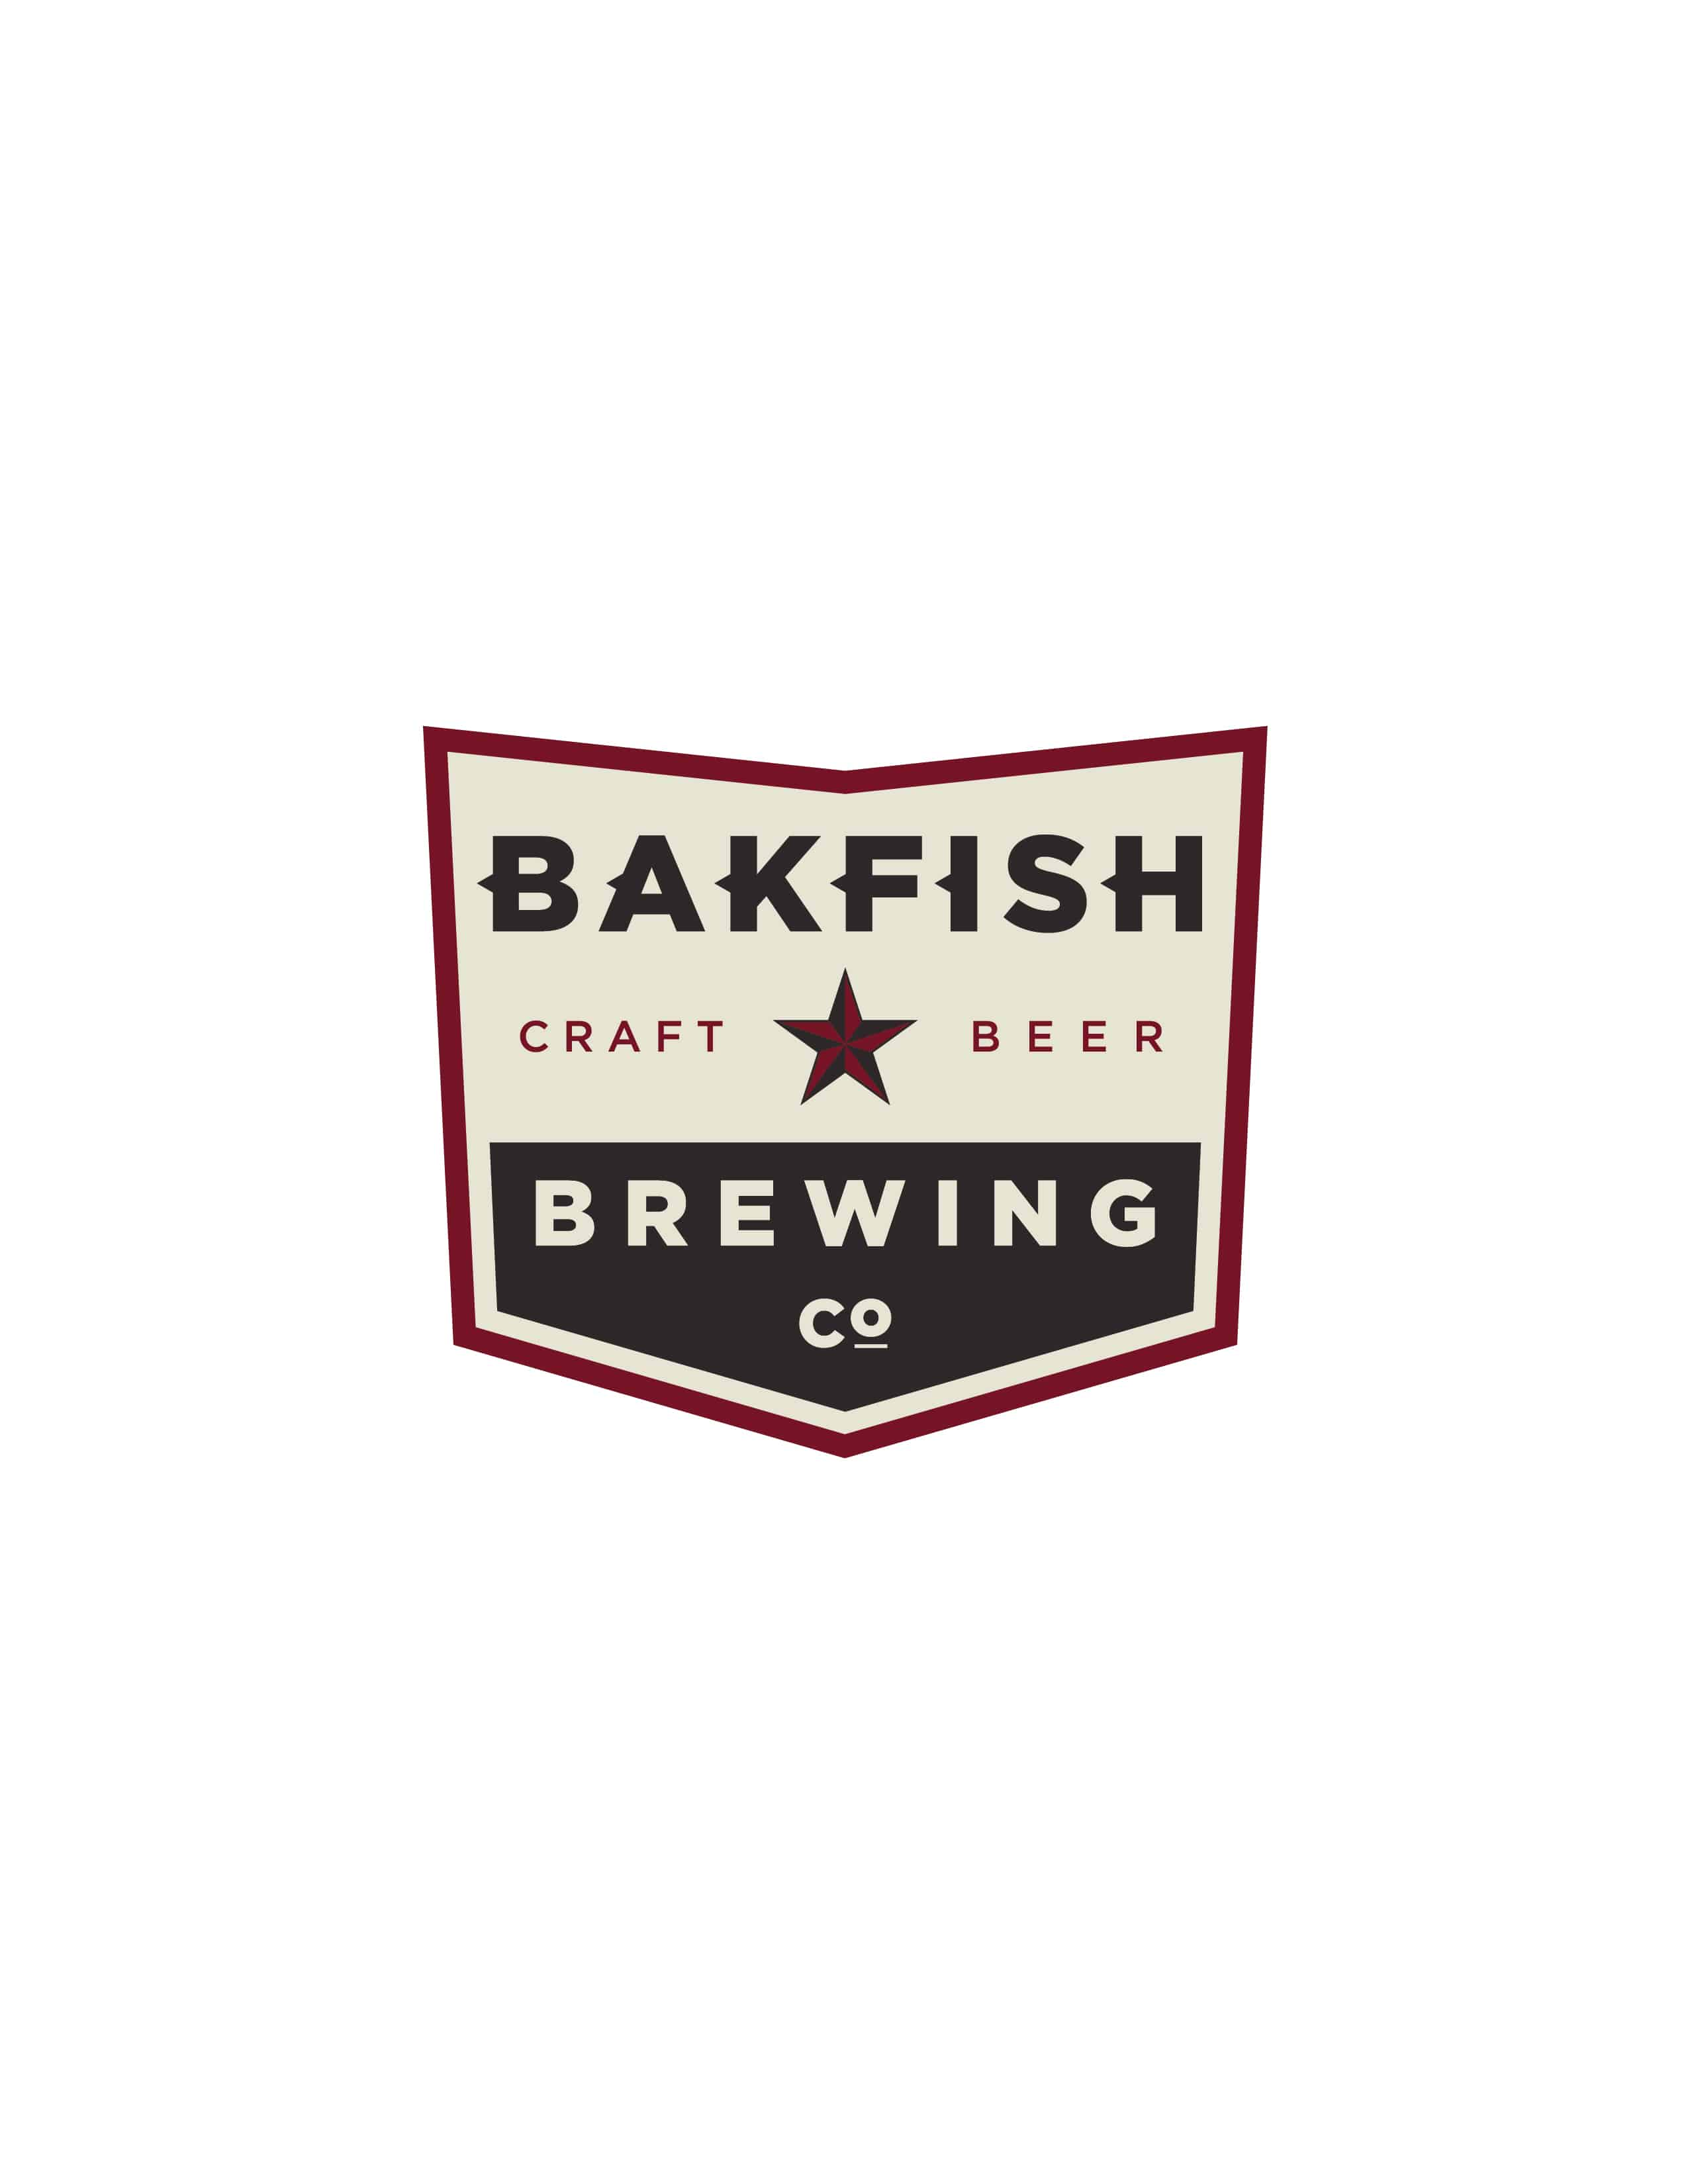 Bakfish Brewing Co